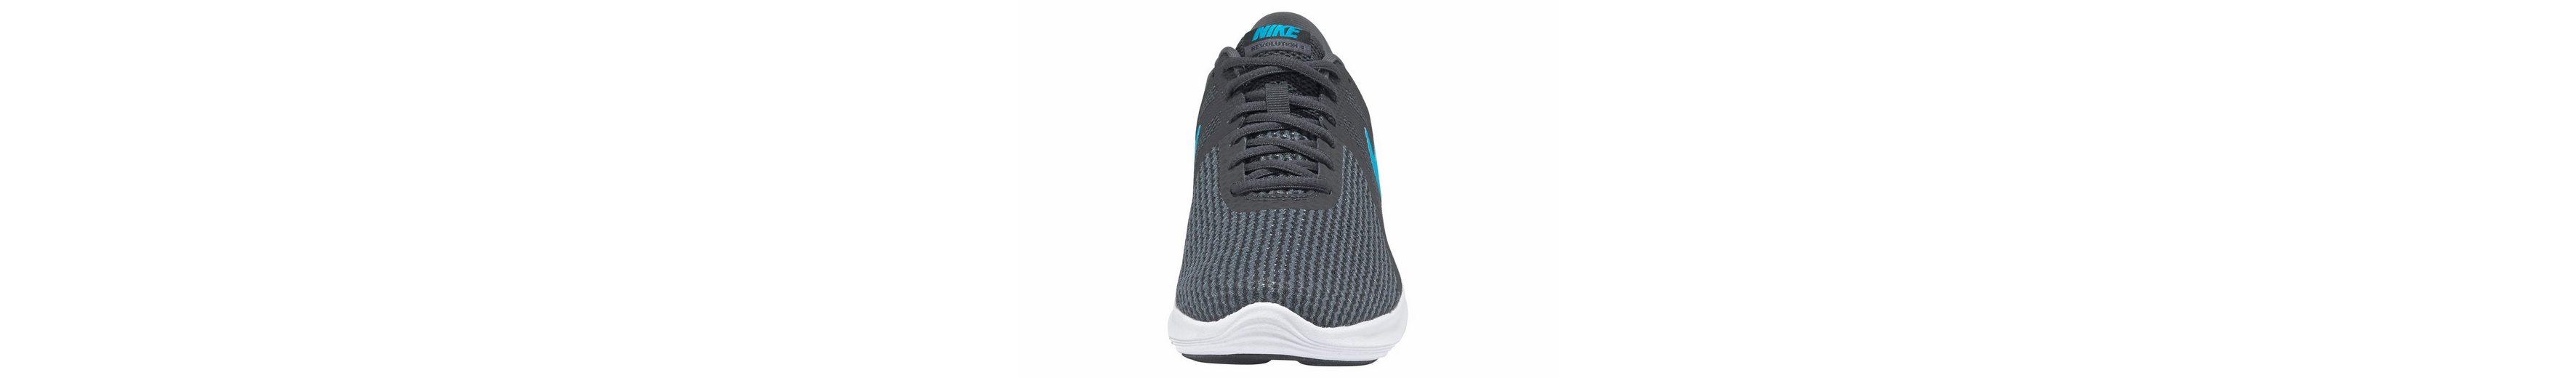 Nike Revolution 4 Laufschuh Freies Verschiffen Wahl mpFlAp